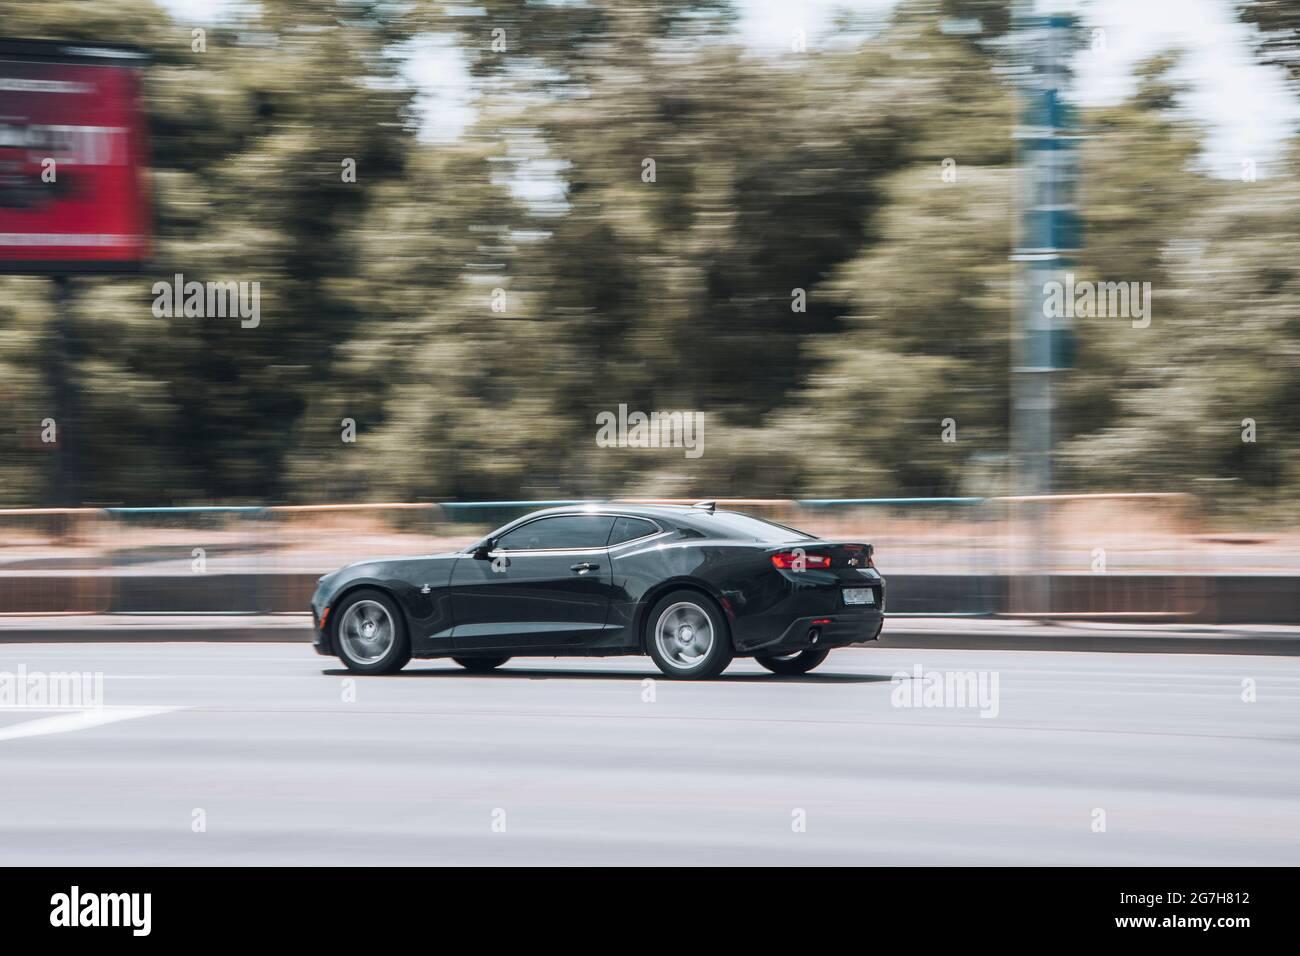 ukraine, kyiv - 27 june 2021: black chevrolet camaro car